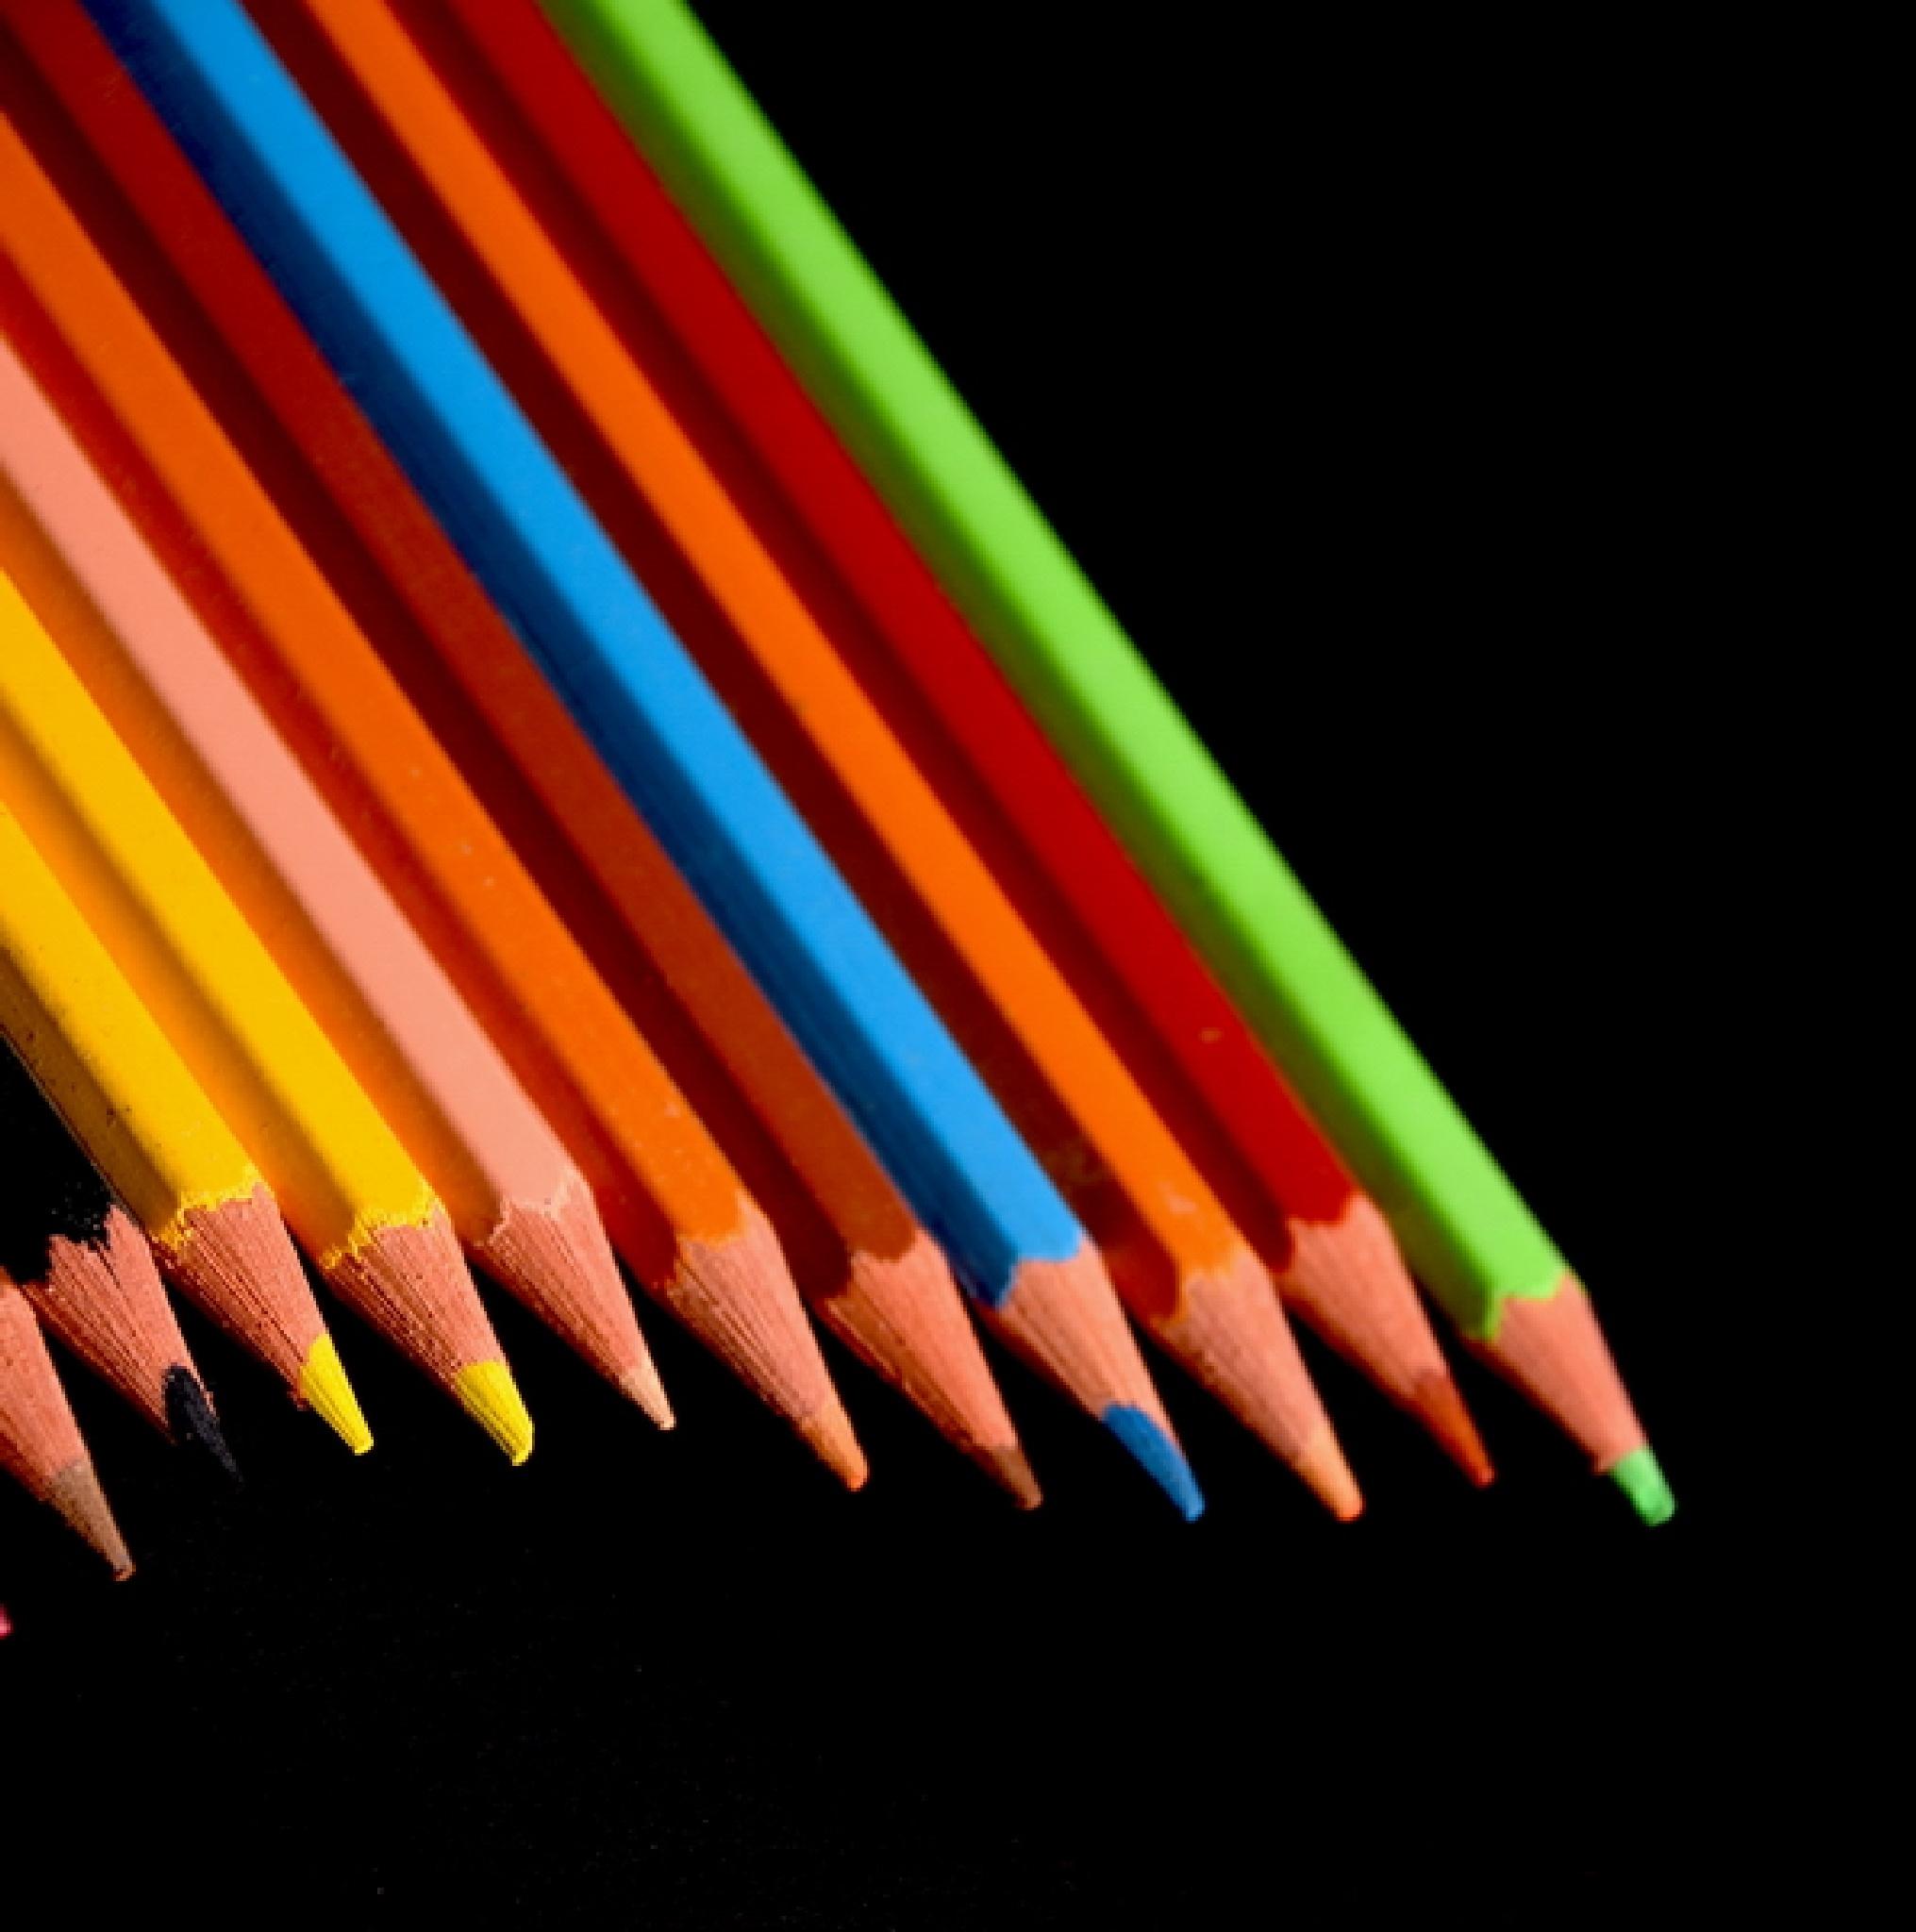 Pencils by NaumanMughal